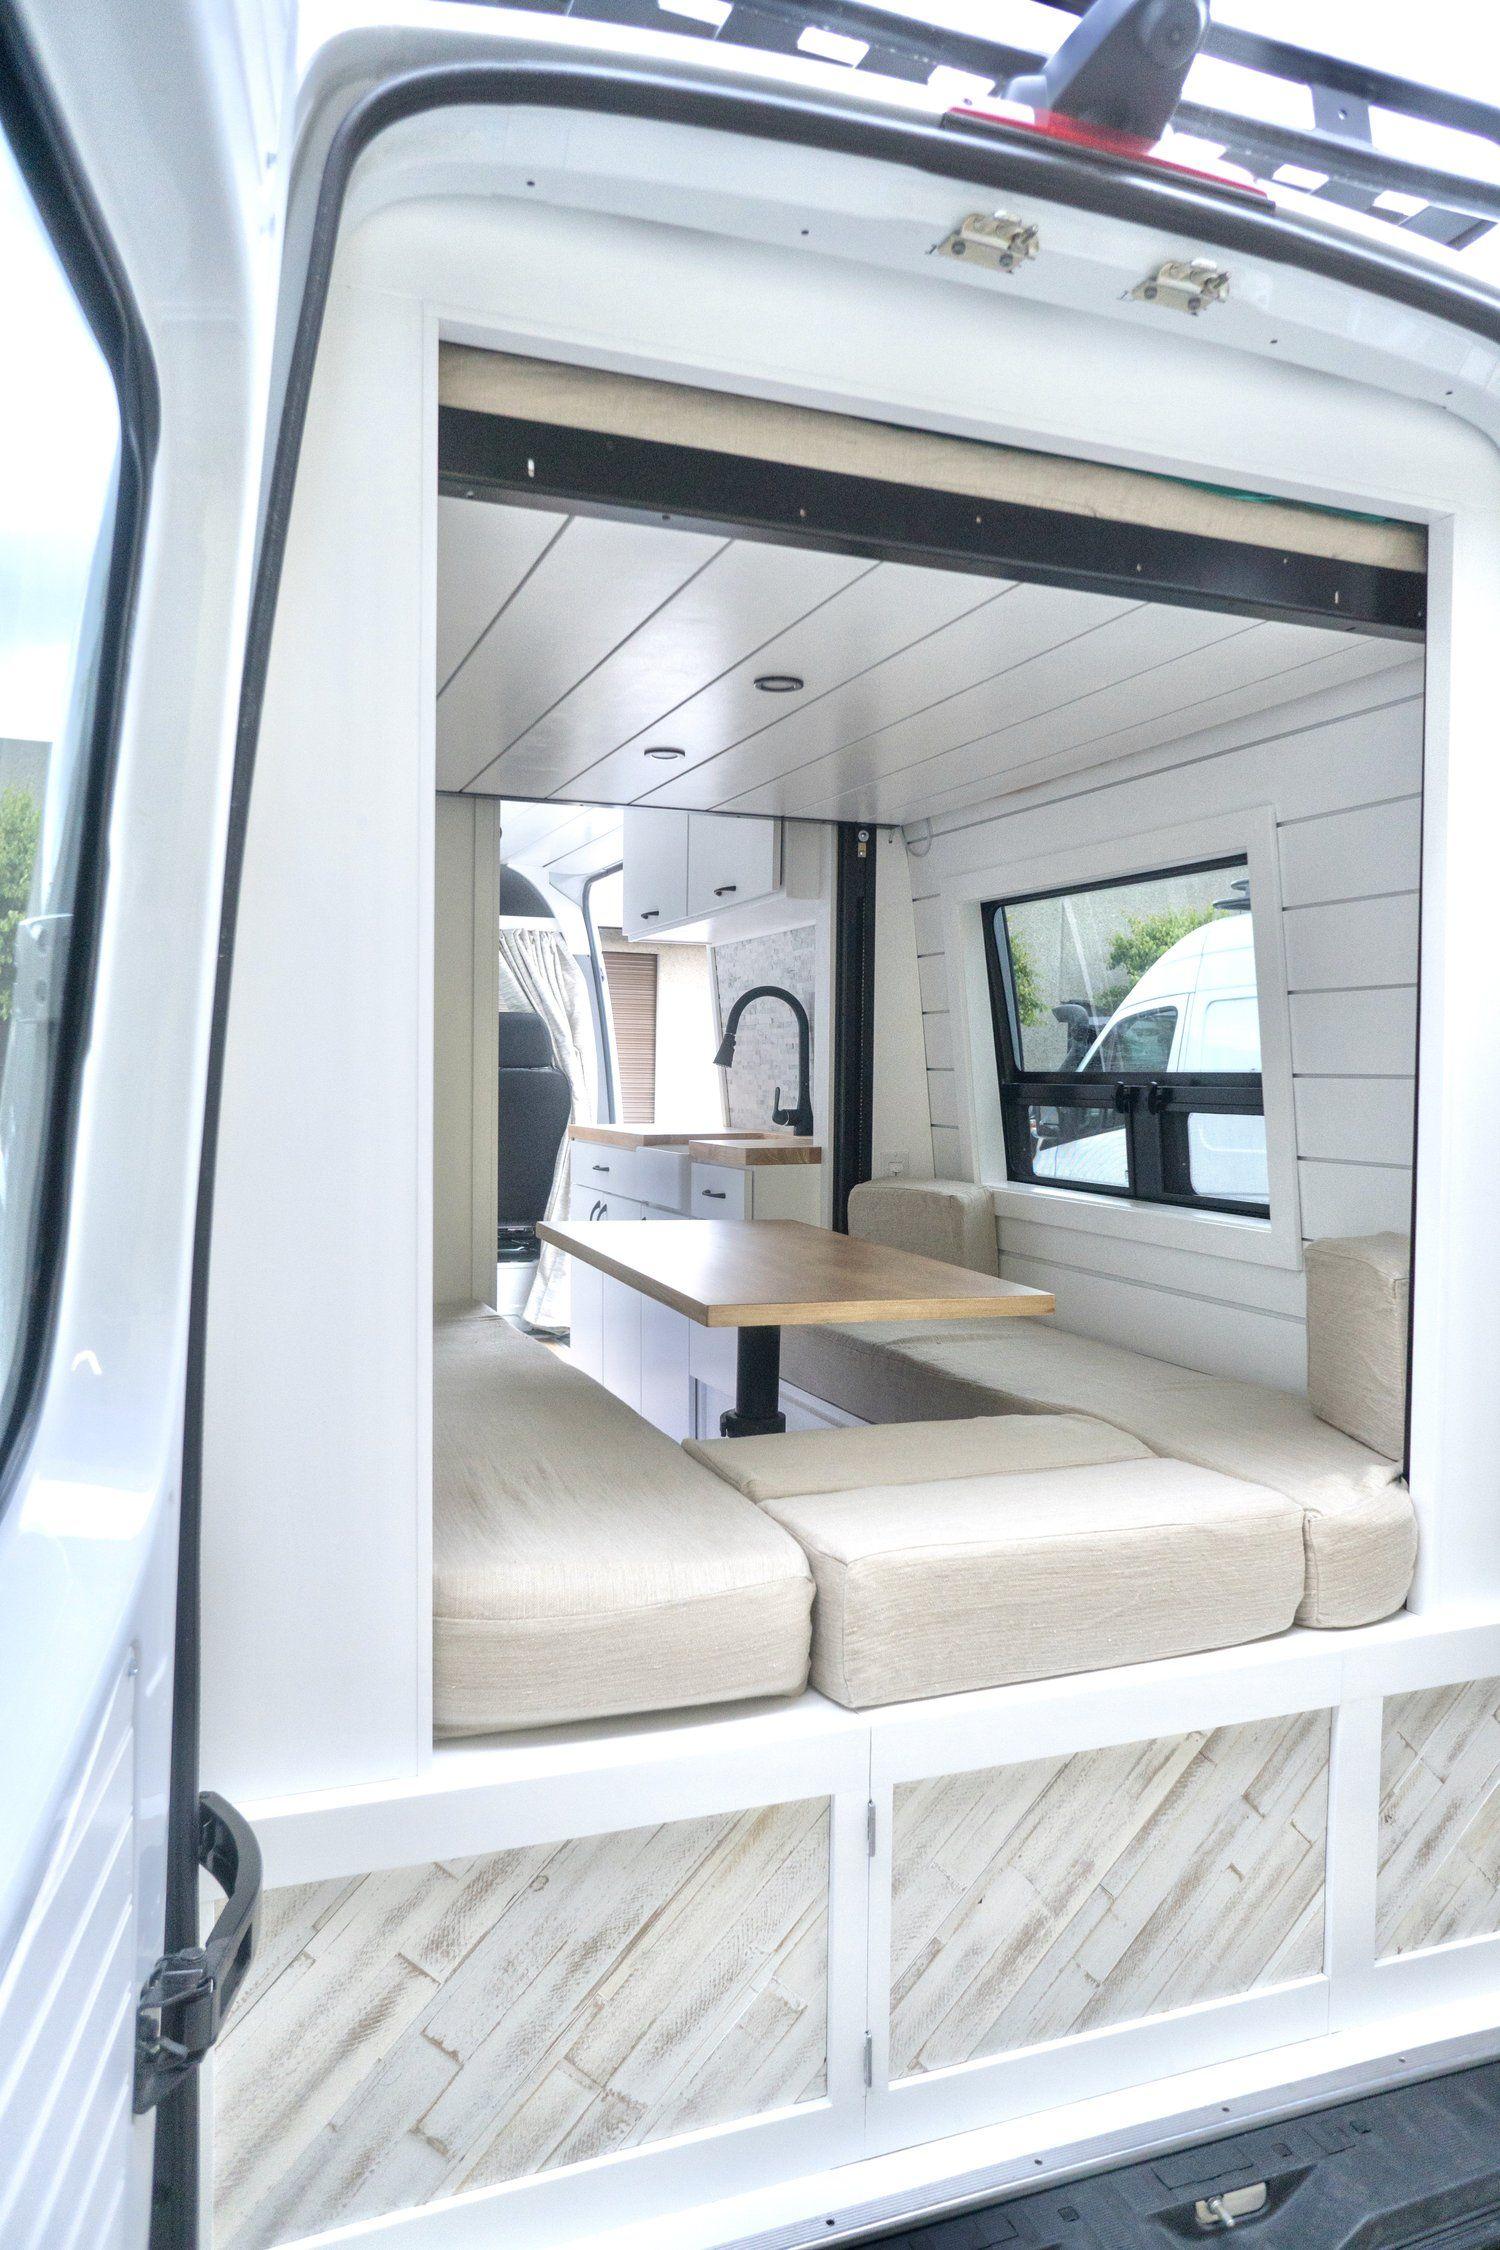 Photo of 4×4 SPRINTER VAN TOUR | 170″ Extended Sprinter Van Conversion for Family of Four — Sara & Alex James – 40 Hours of Freedom